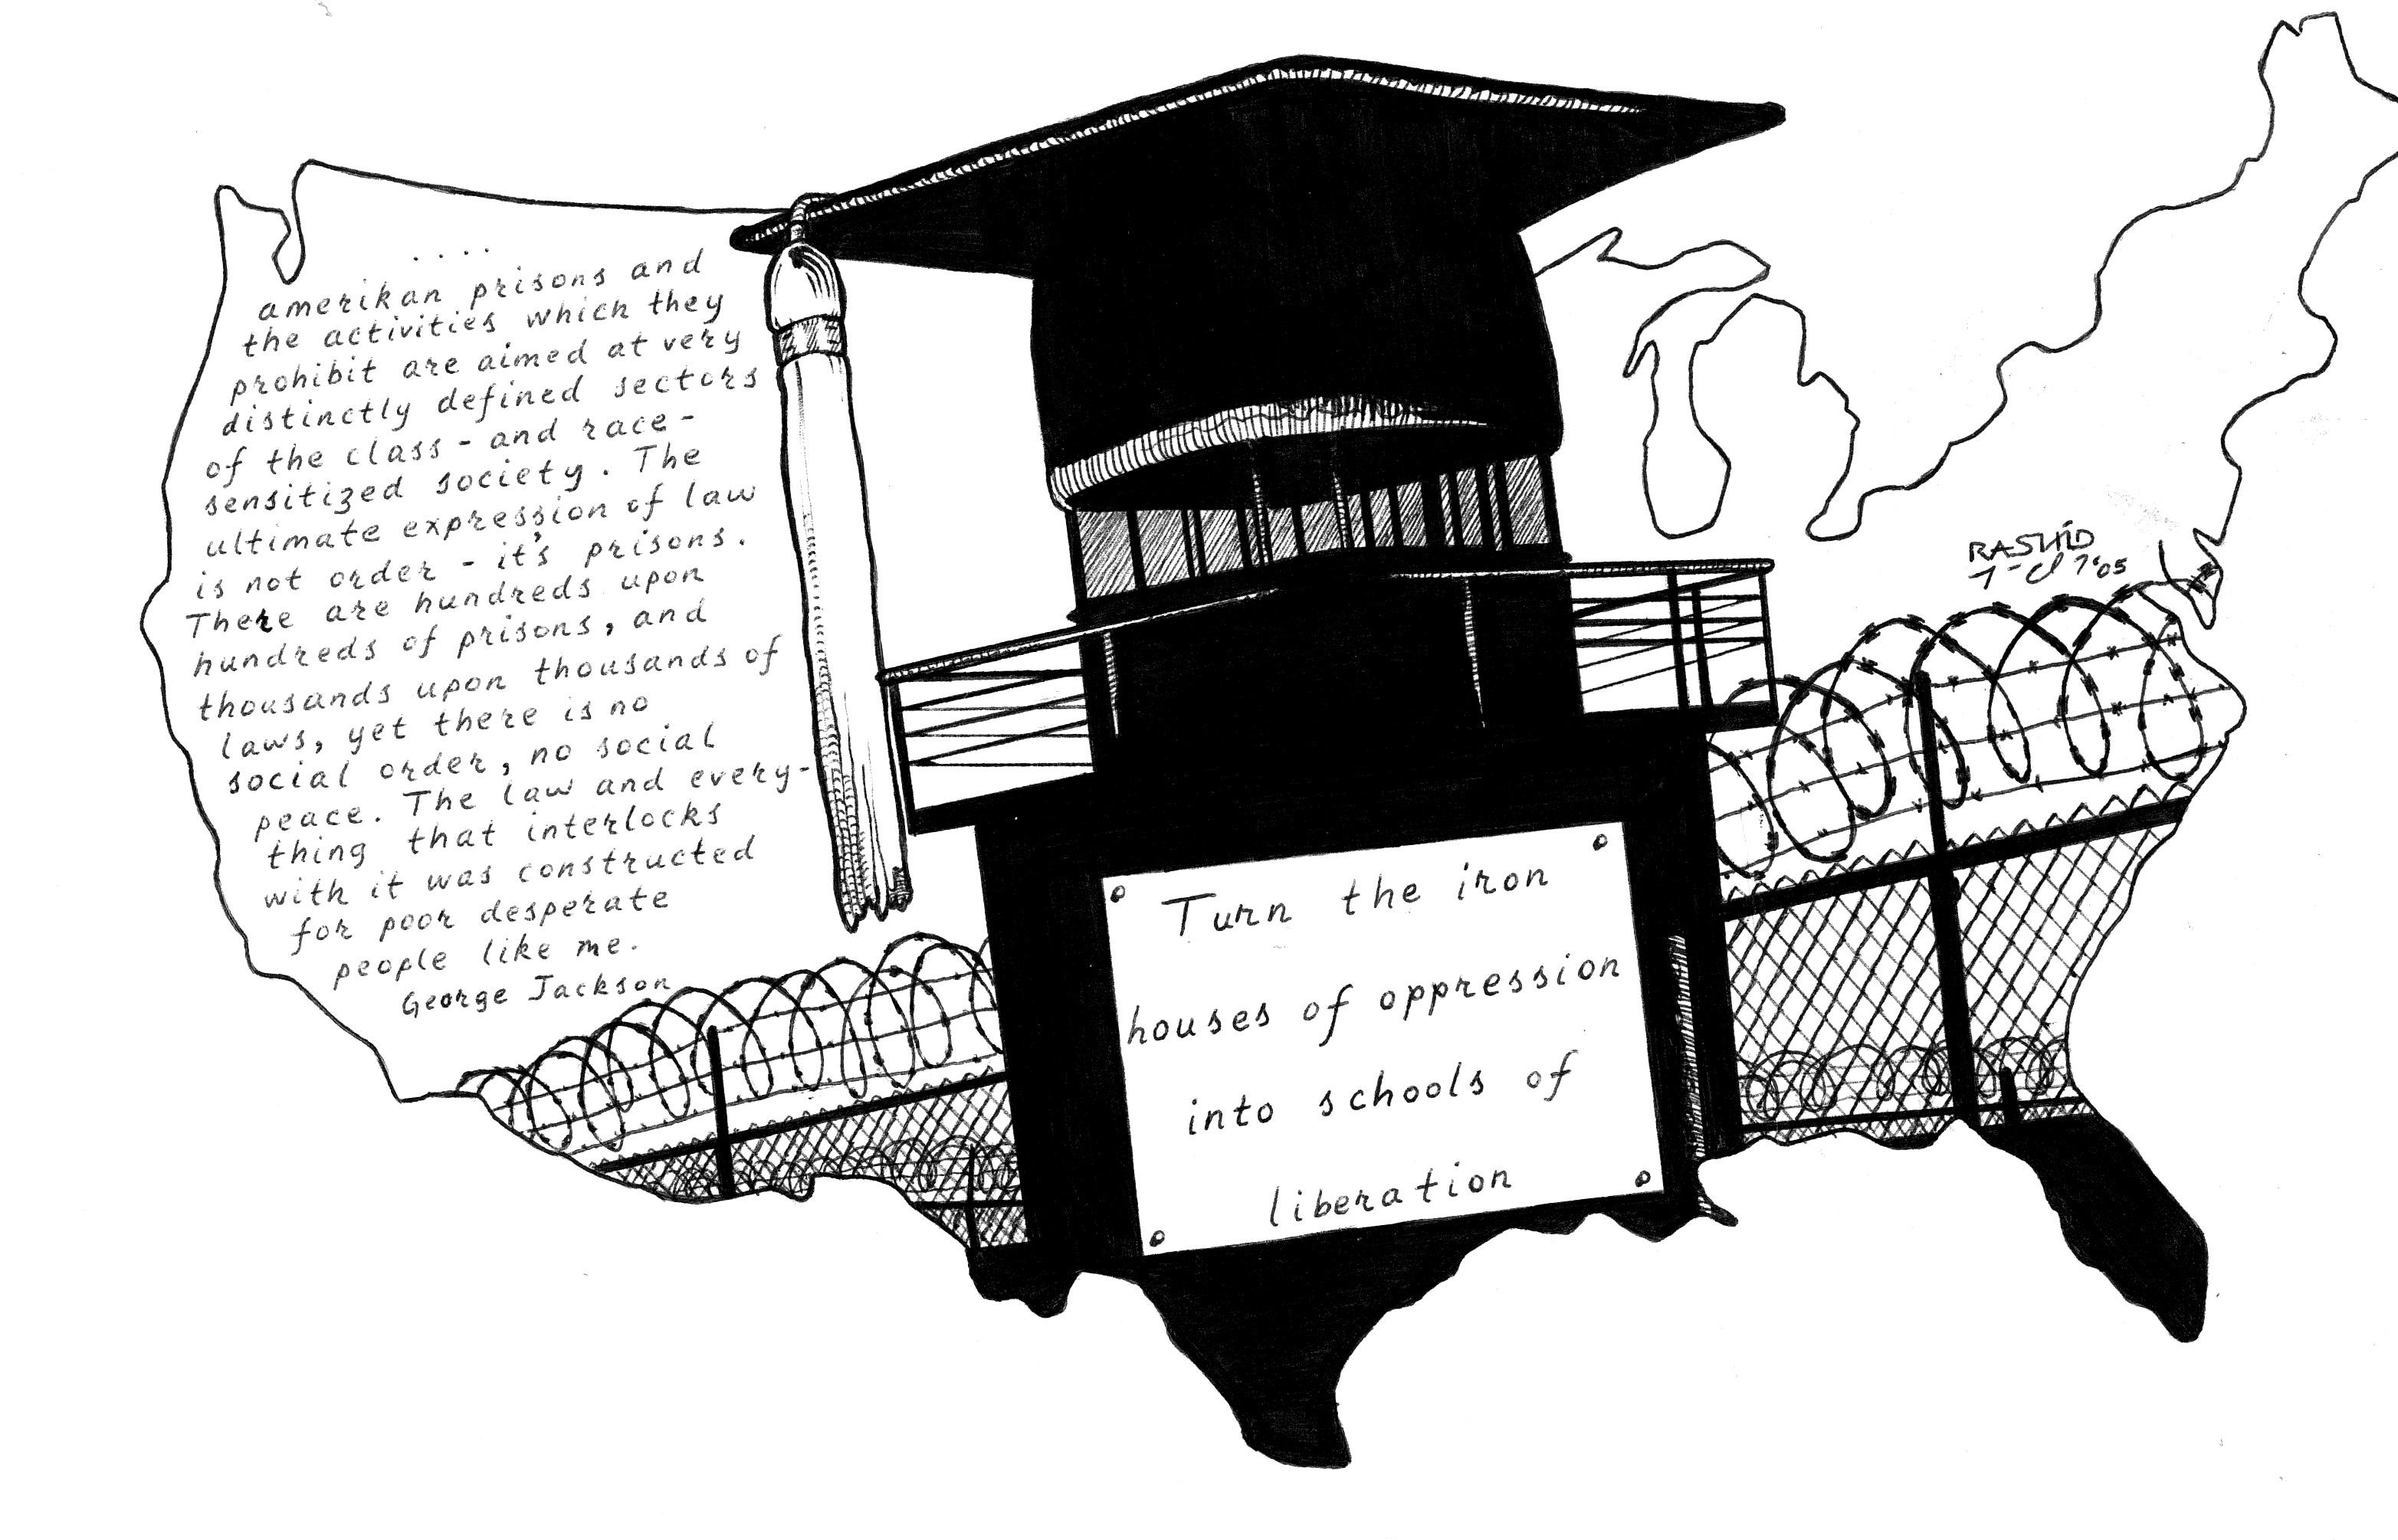 Schools of Liberation